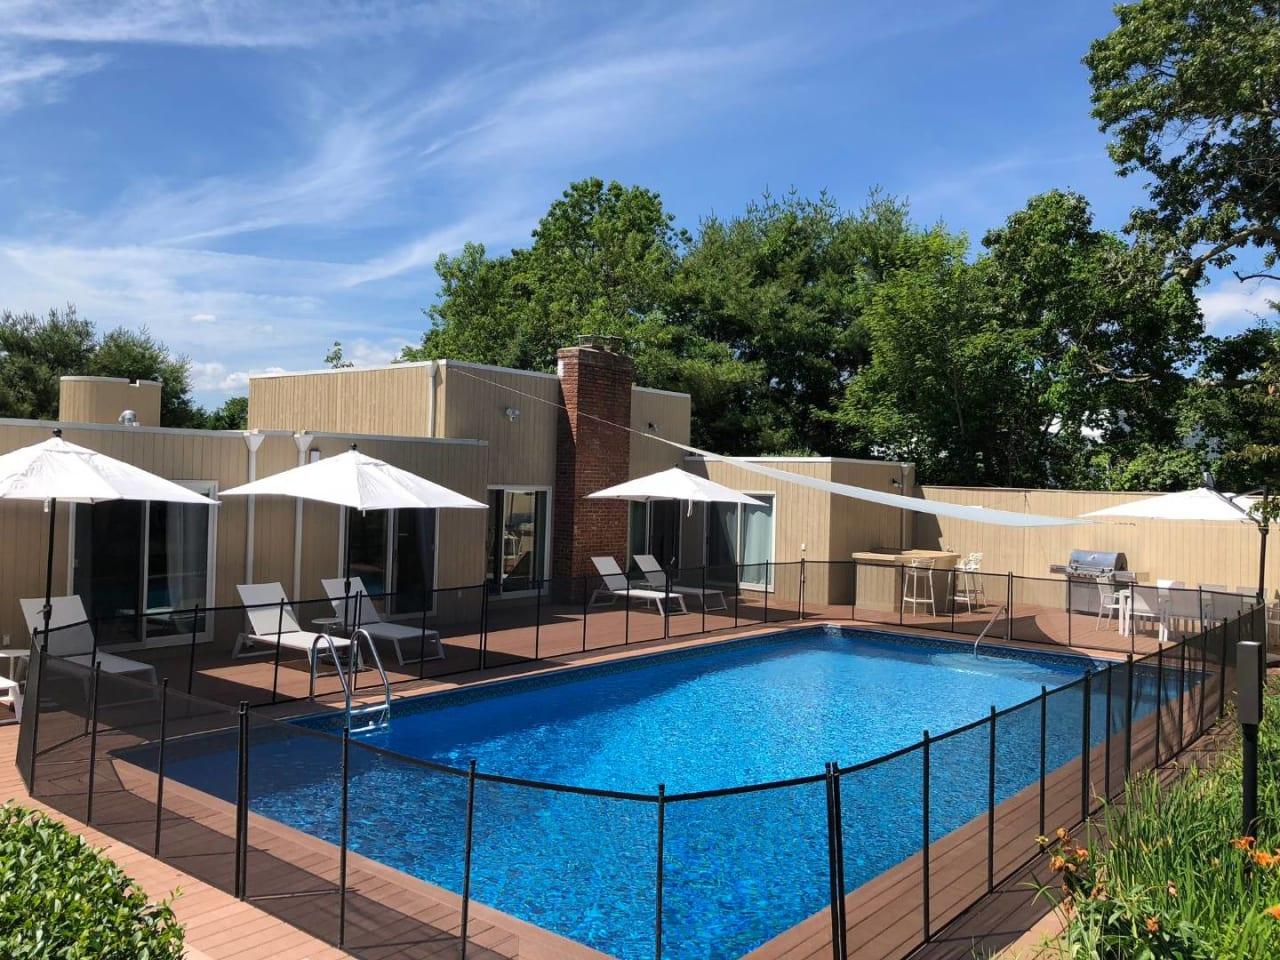 Remsenburg Summer Retreat 2020 | Pool & Tennis